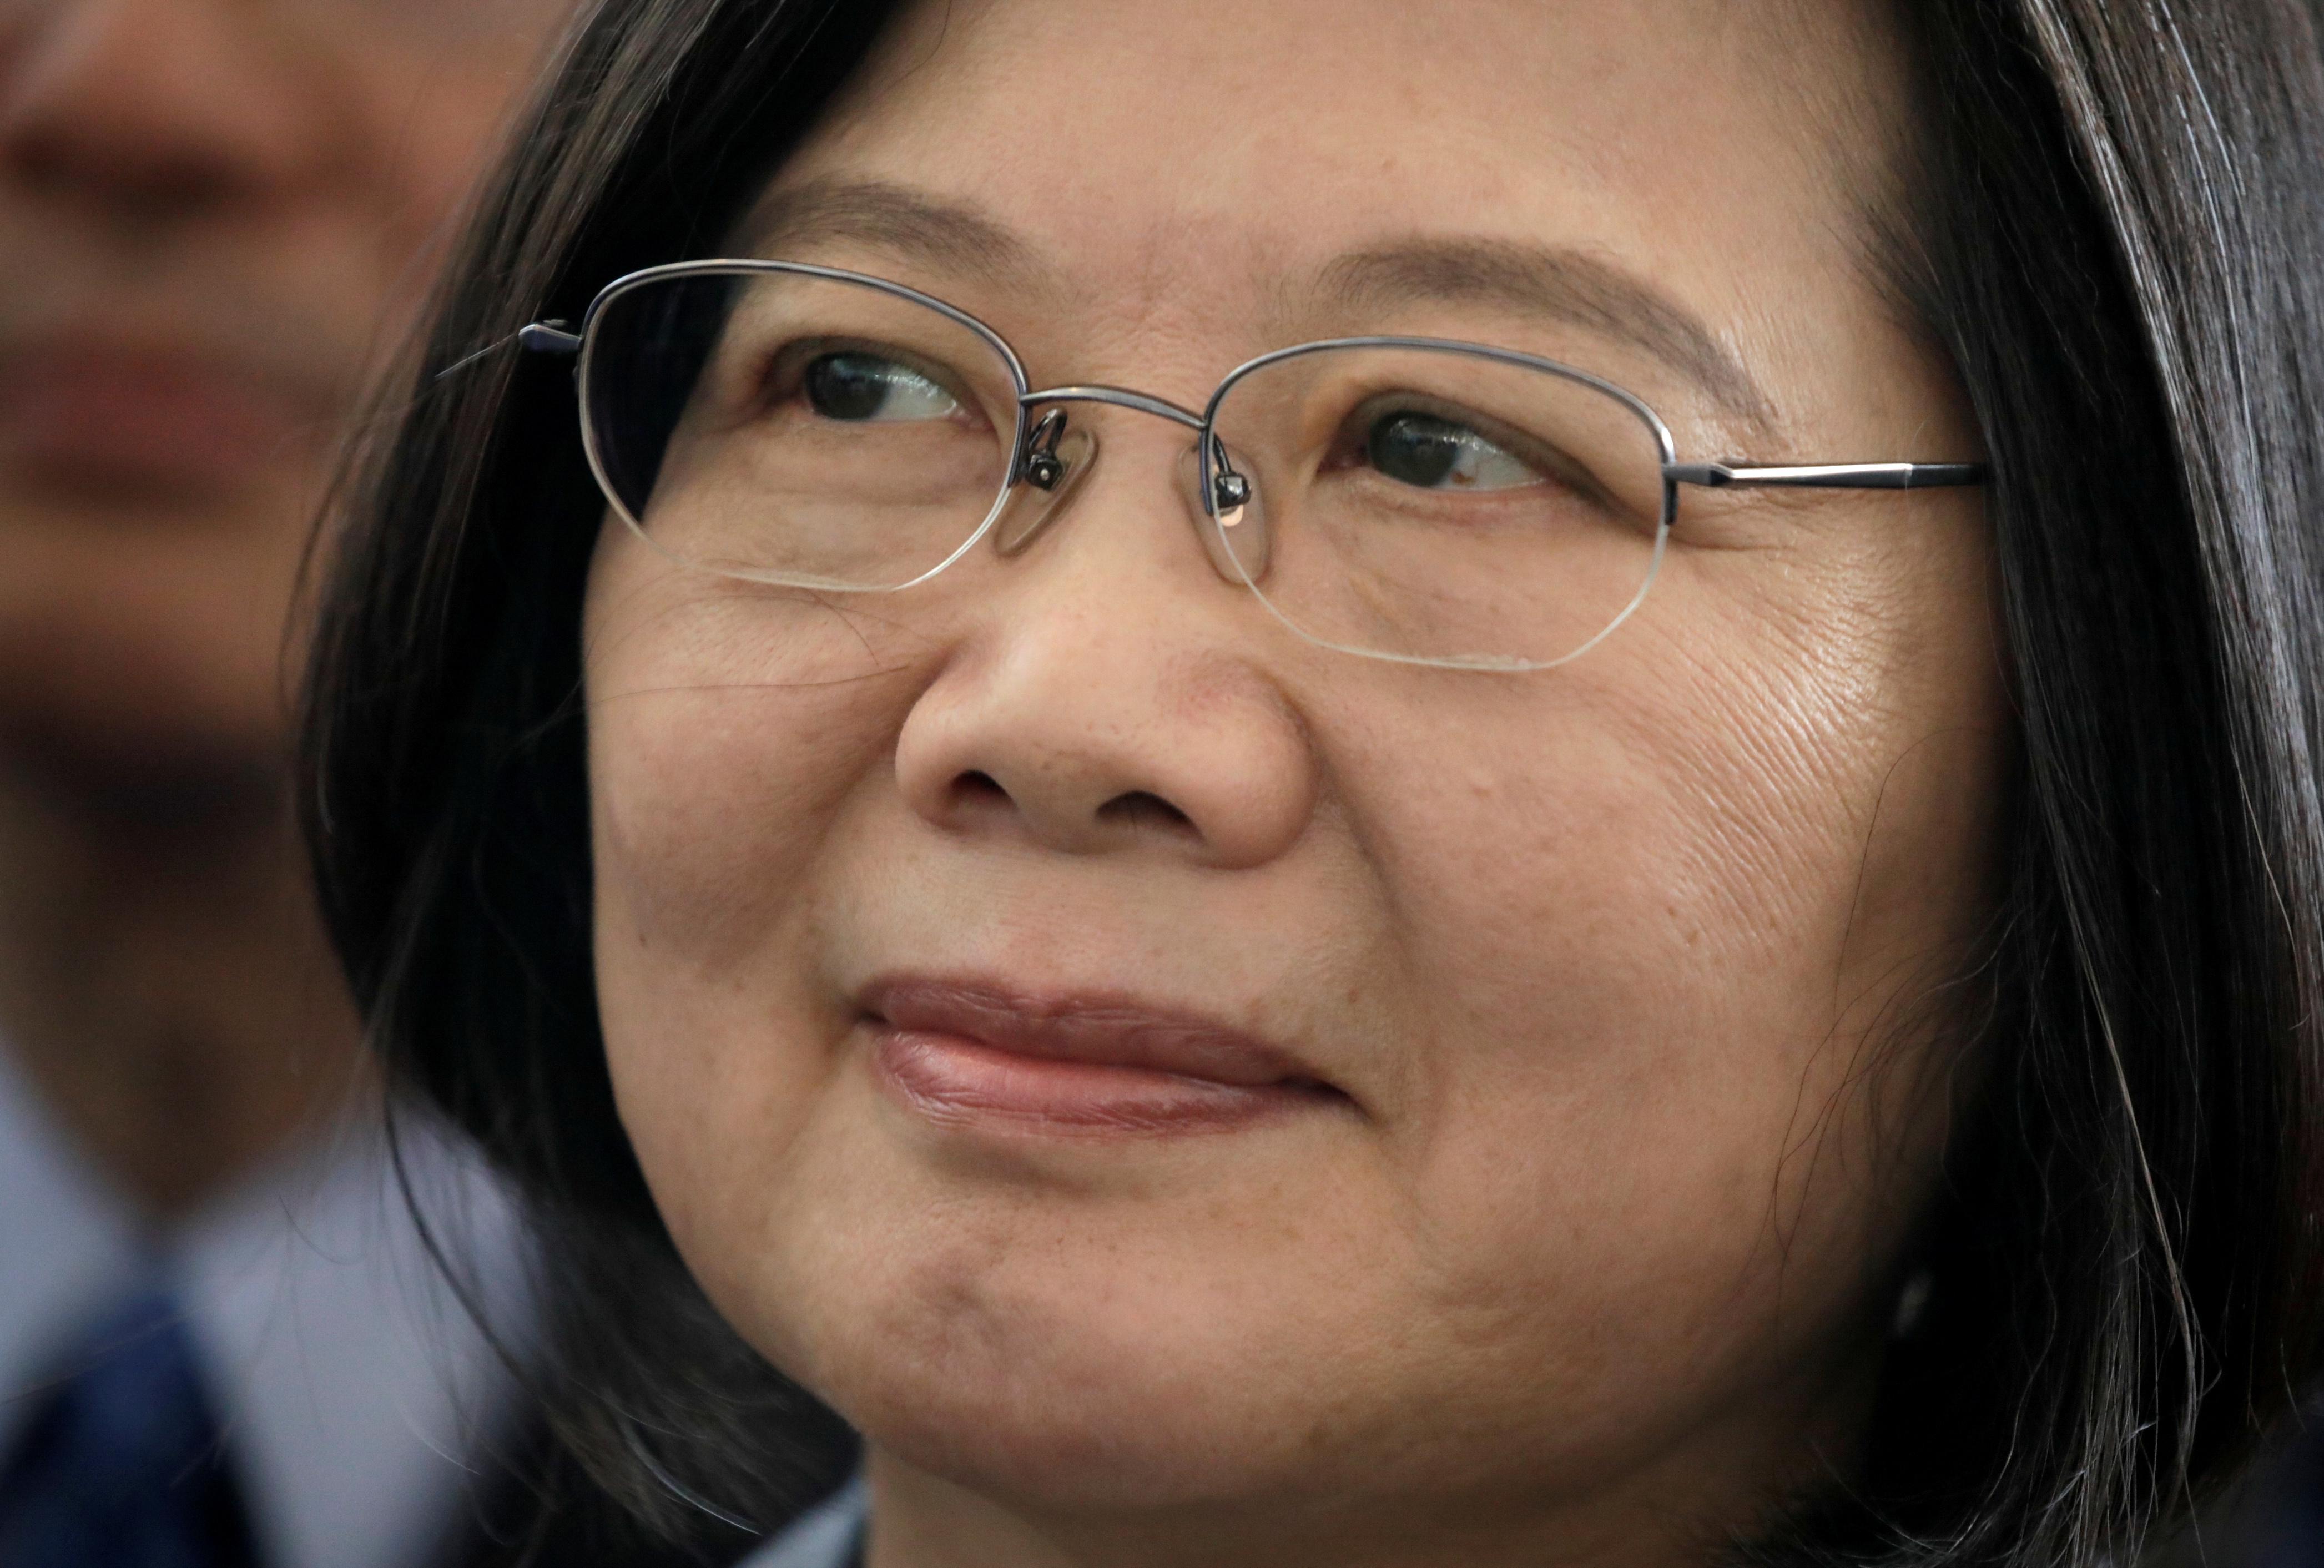 China says will 'fully respect' Taiwan's way of life